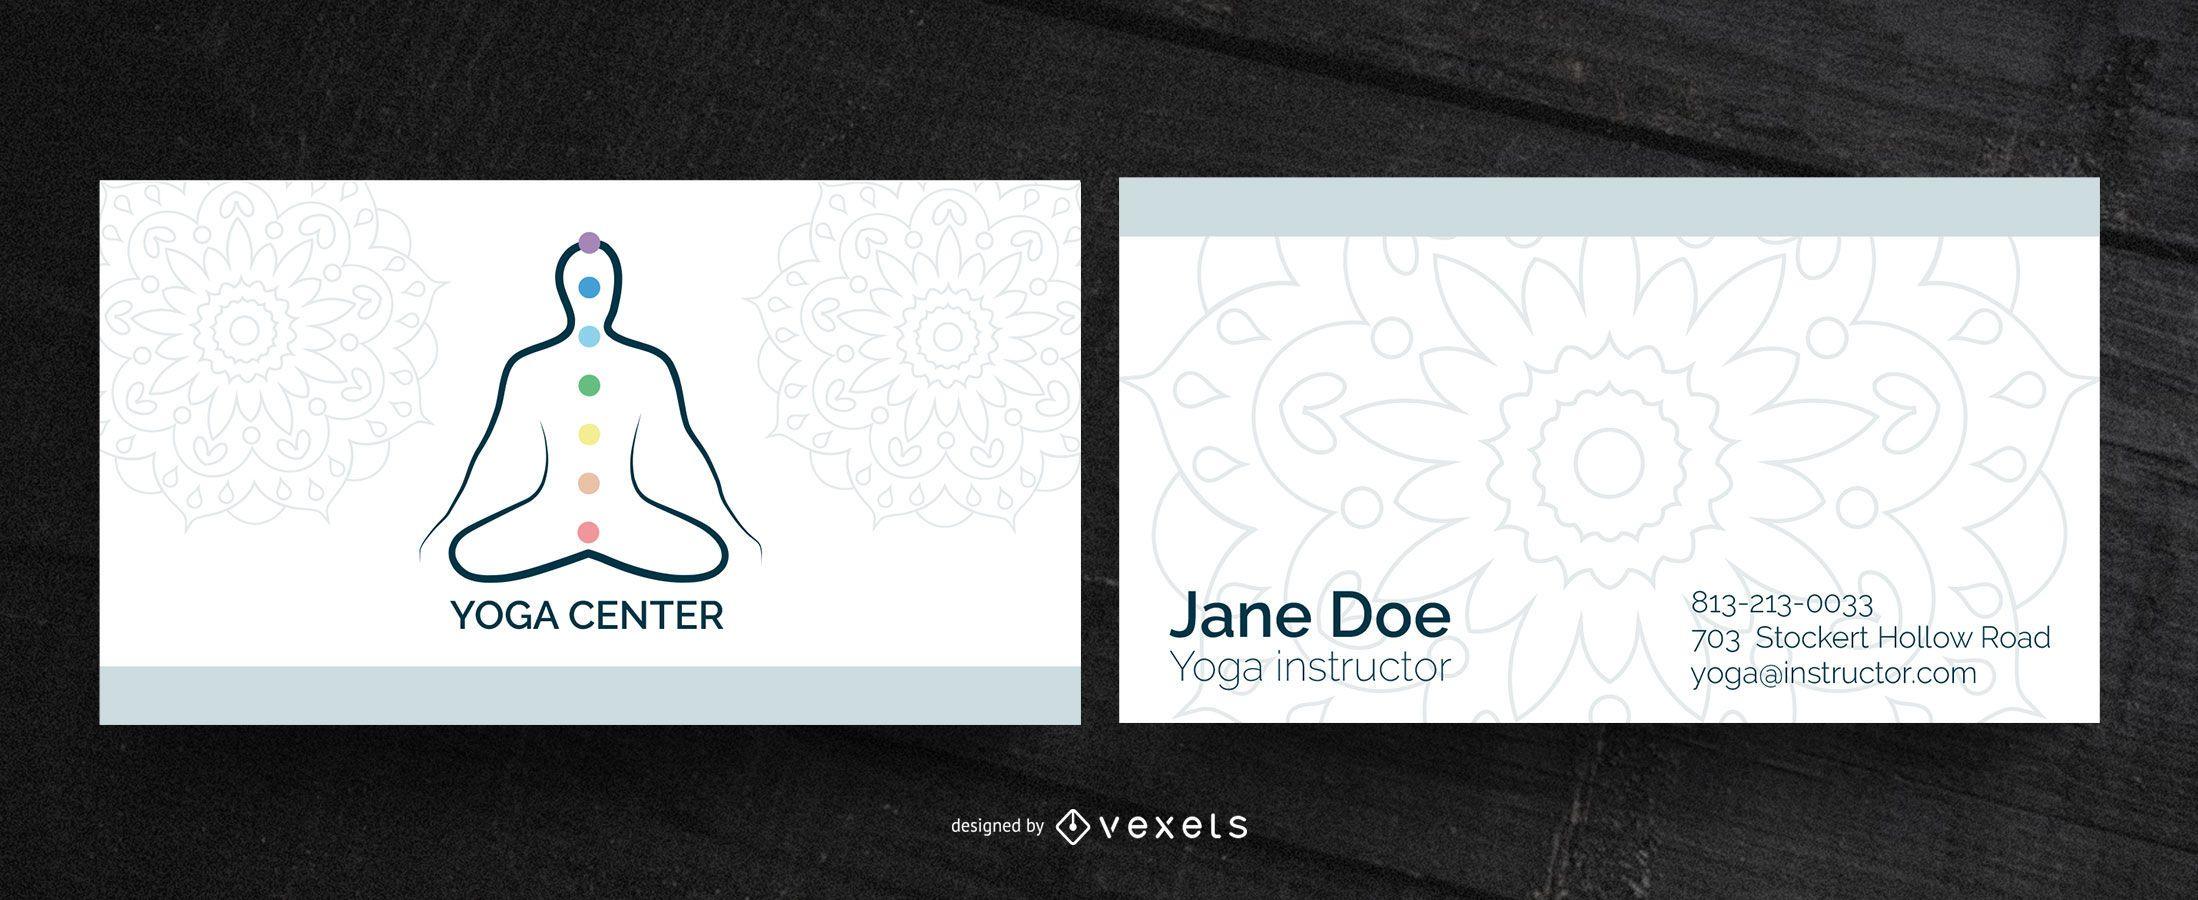 Yoga center business card